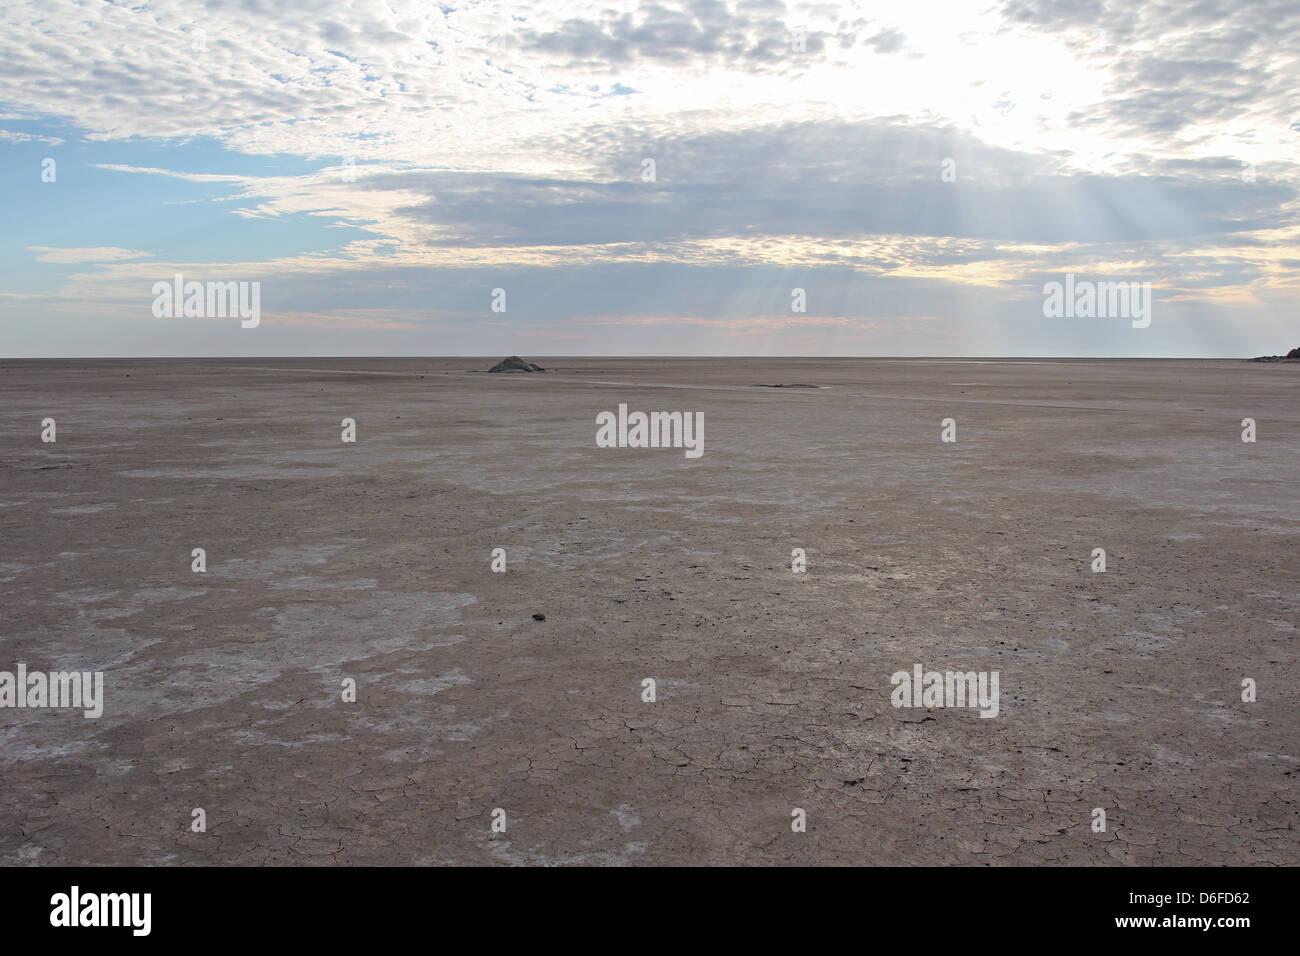 Sua salt pan close to Kubu Island in the morning sun, Makgadikgadi pans, Botswana - Stock Image